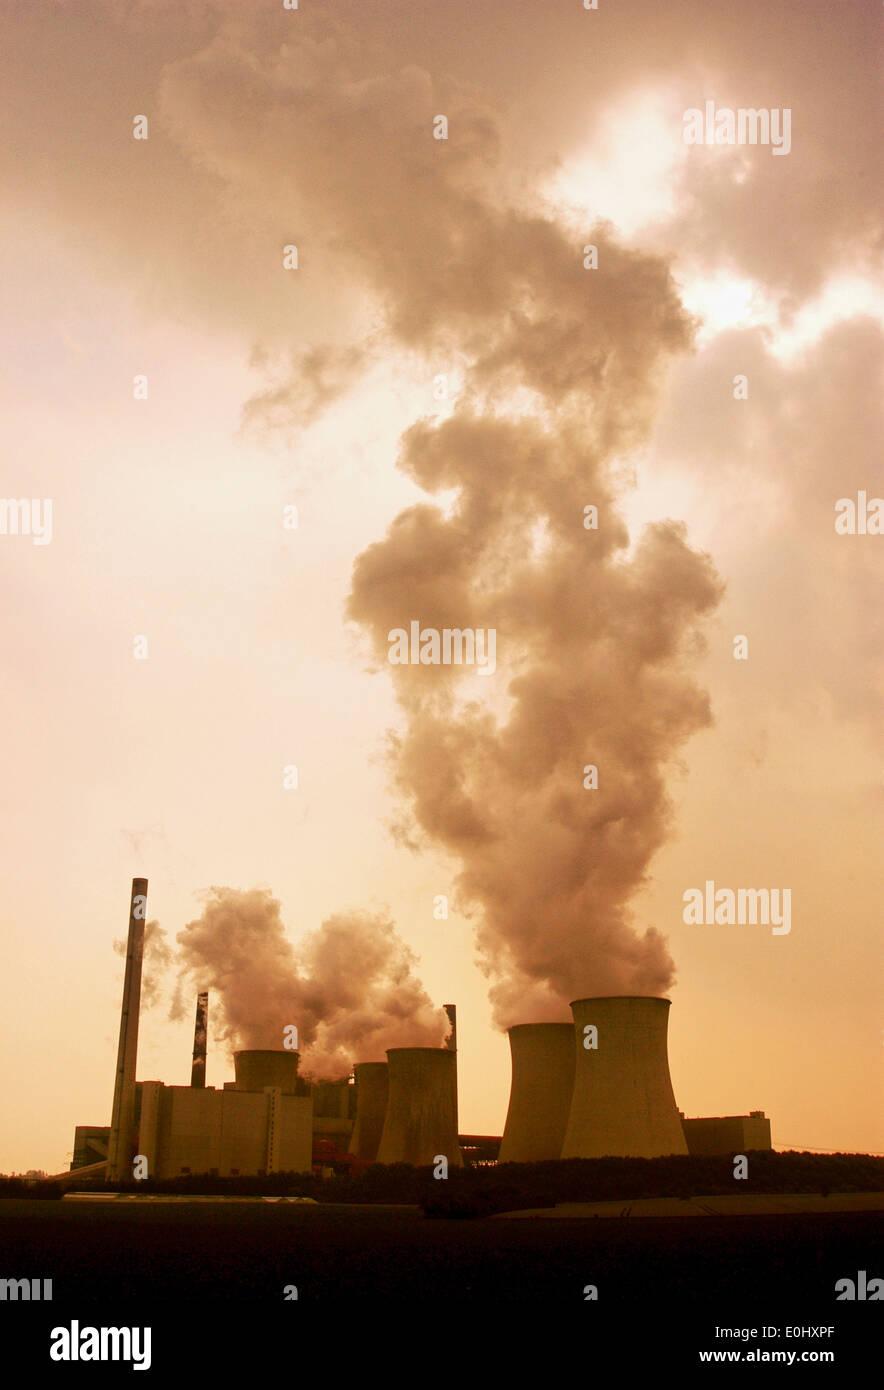 Kamin Köln germany near cologne power plant industrial smoke exhaust